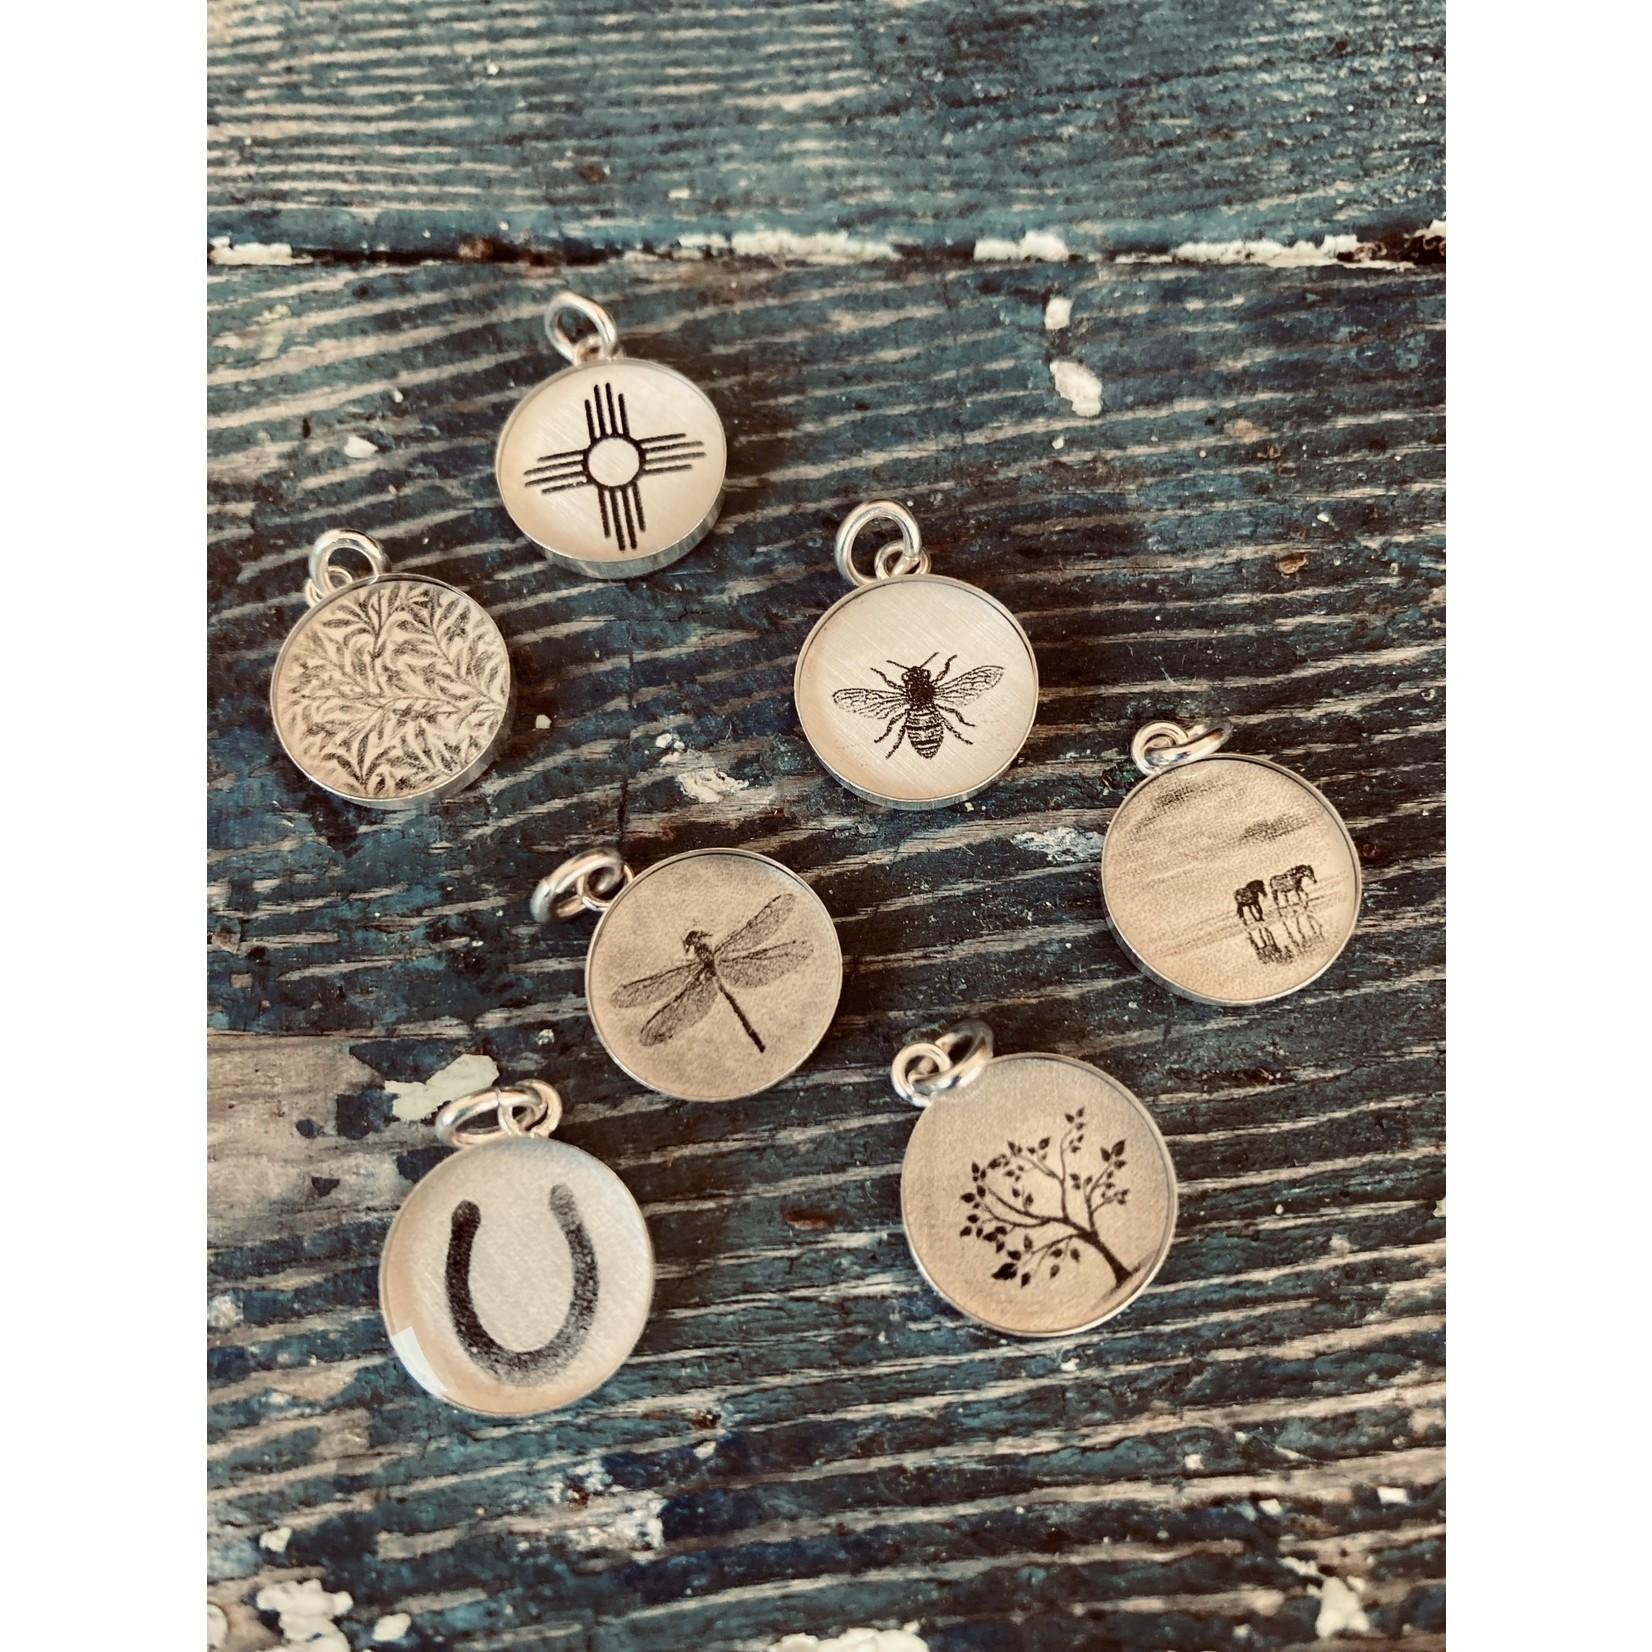 Everyday Artifacts Everyday Artifacts | Horseshoe 12mm SS Bezel Pendant